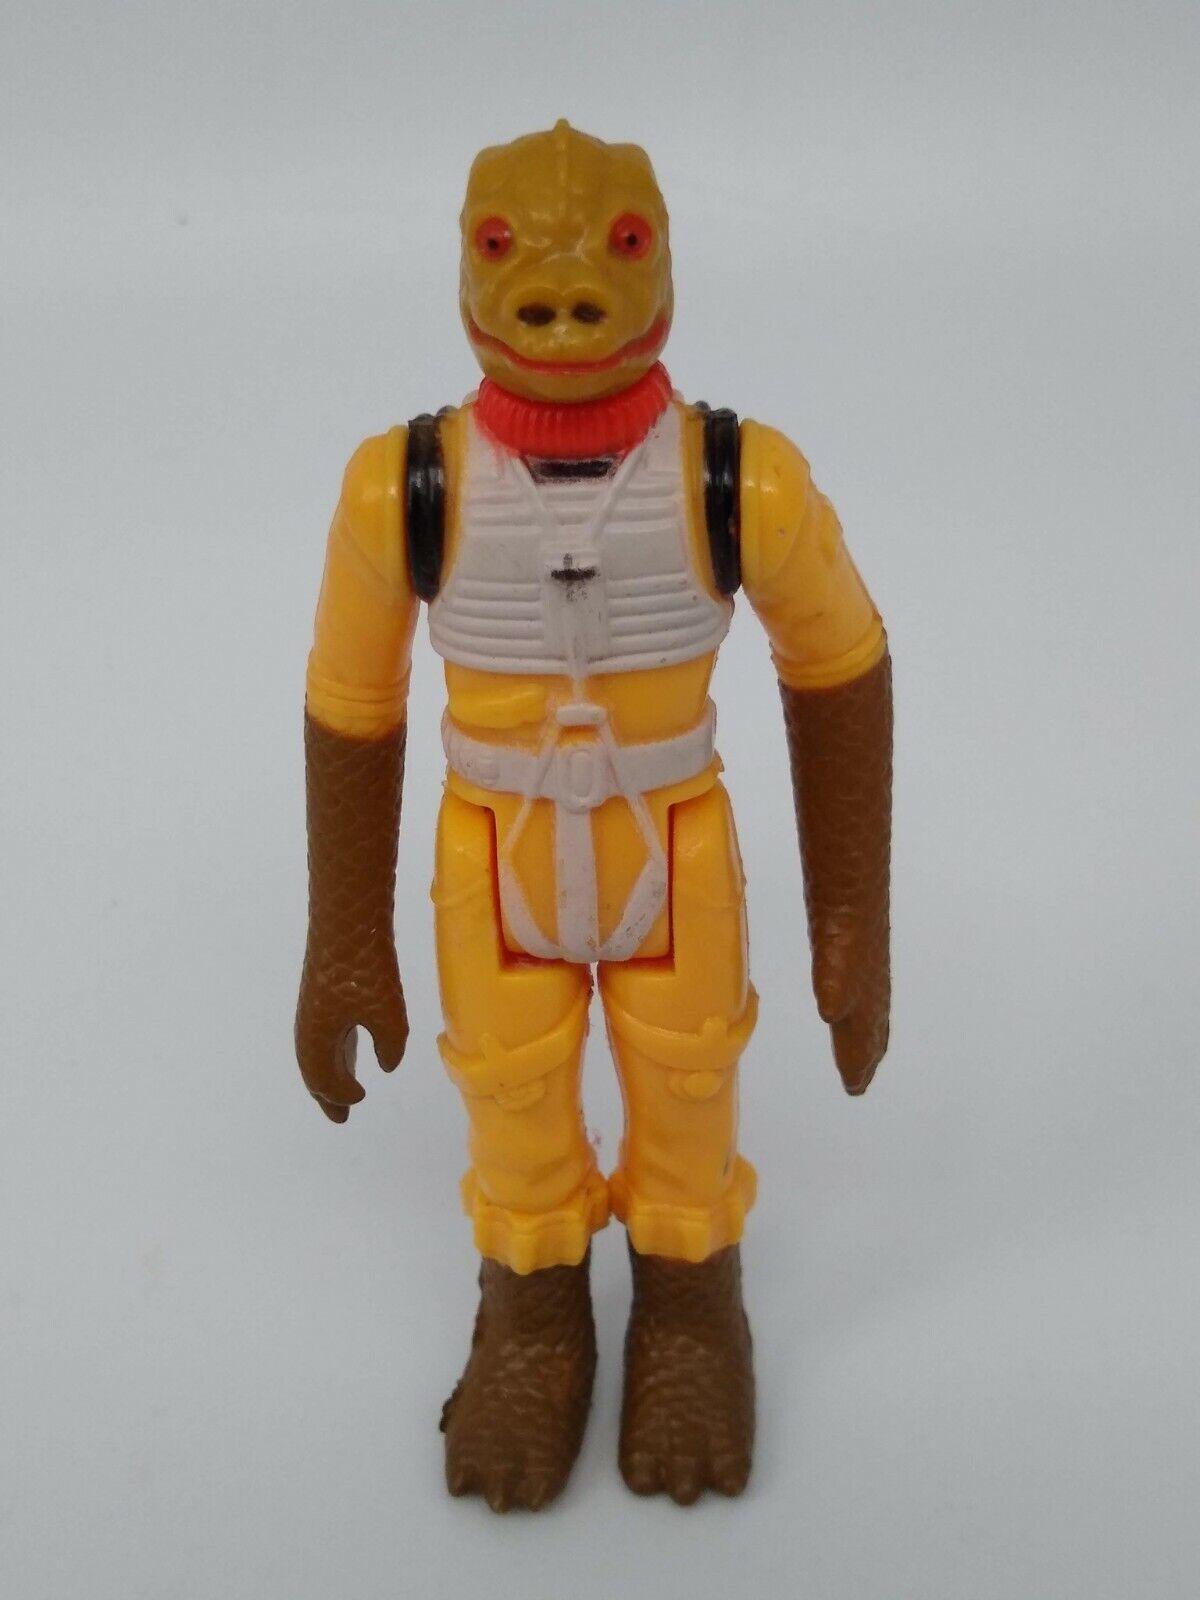 Vintage Star Wars Bounty Hunter Bossk HK COO - Small Eyes Variant